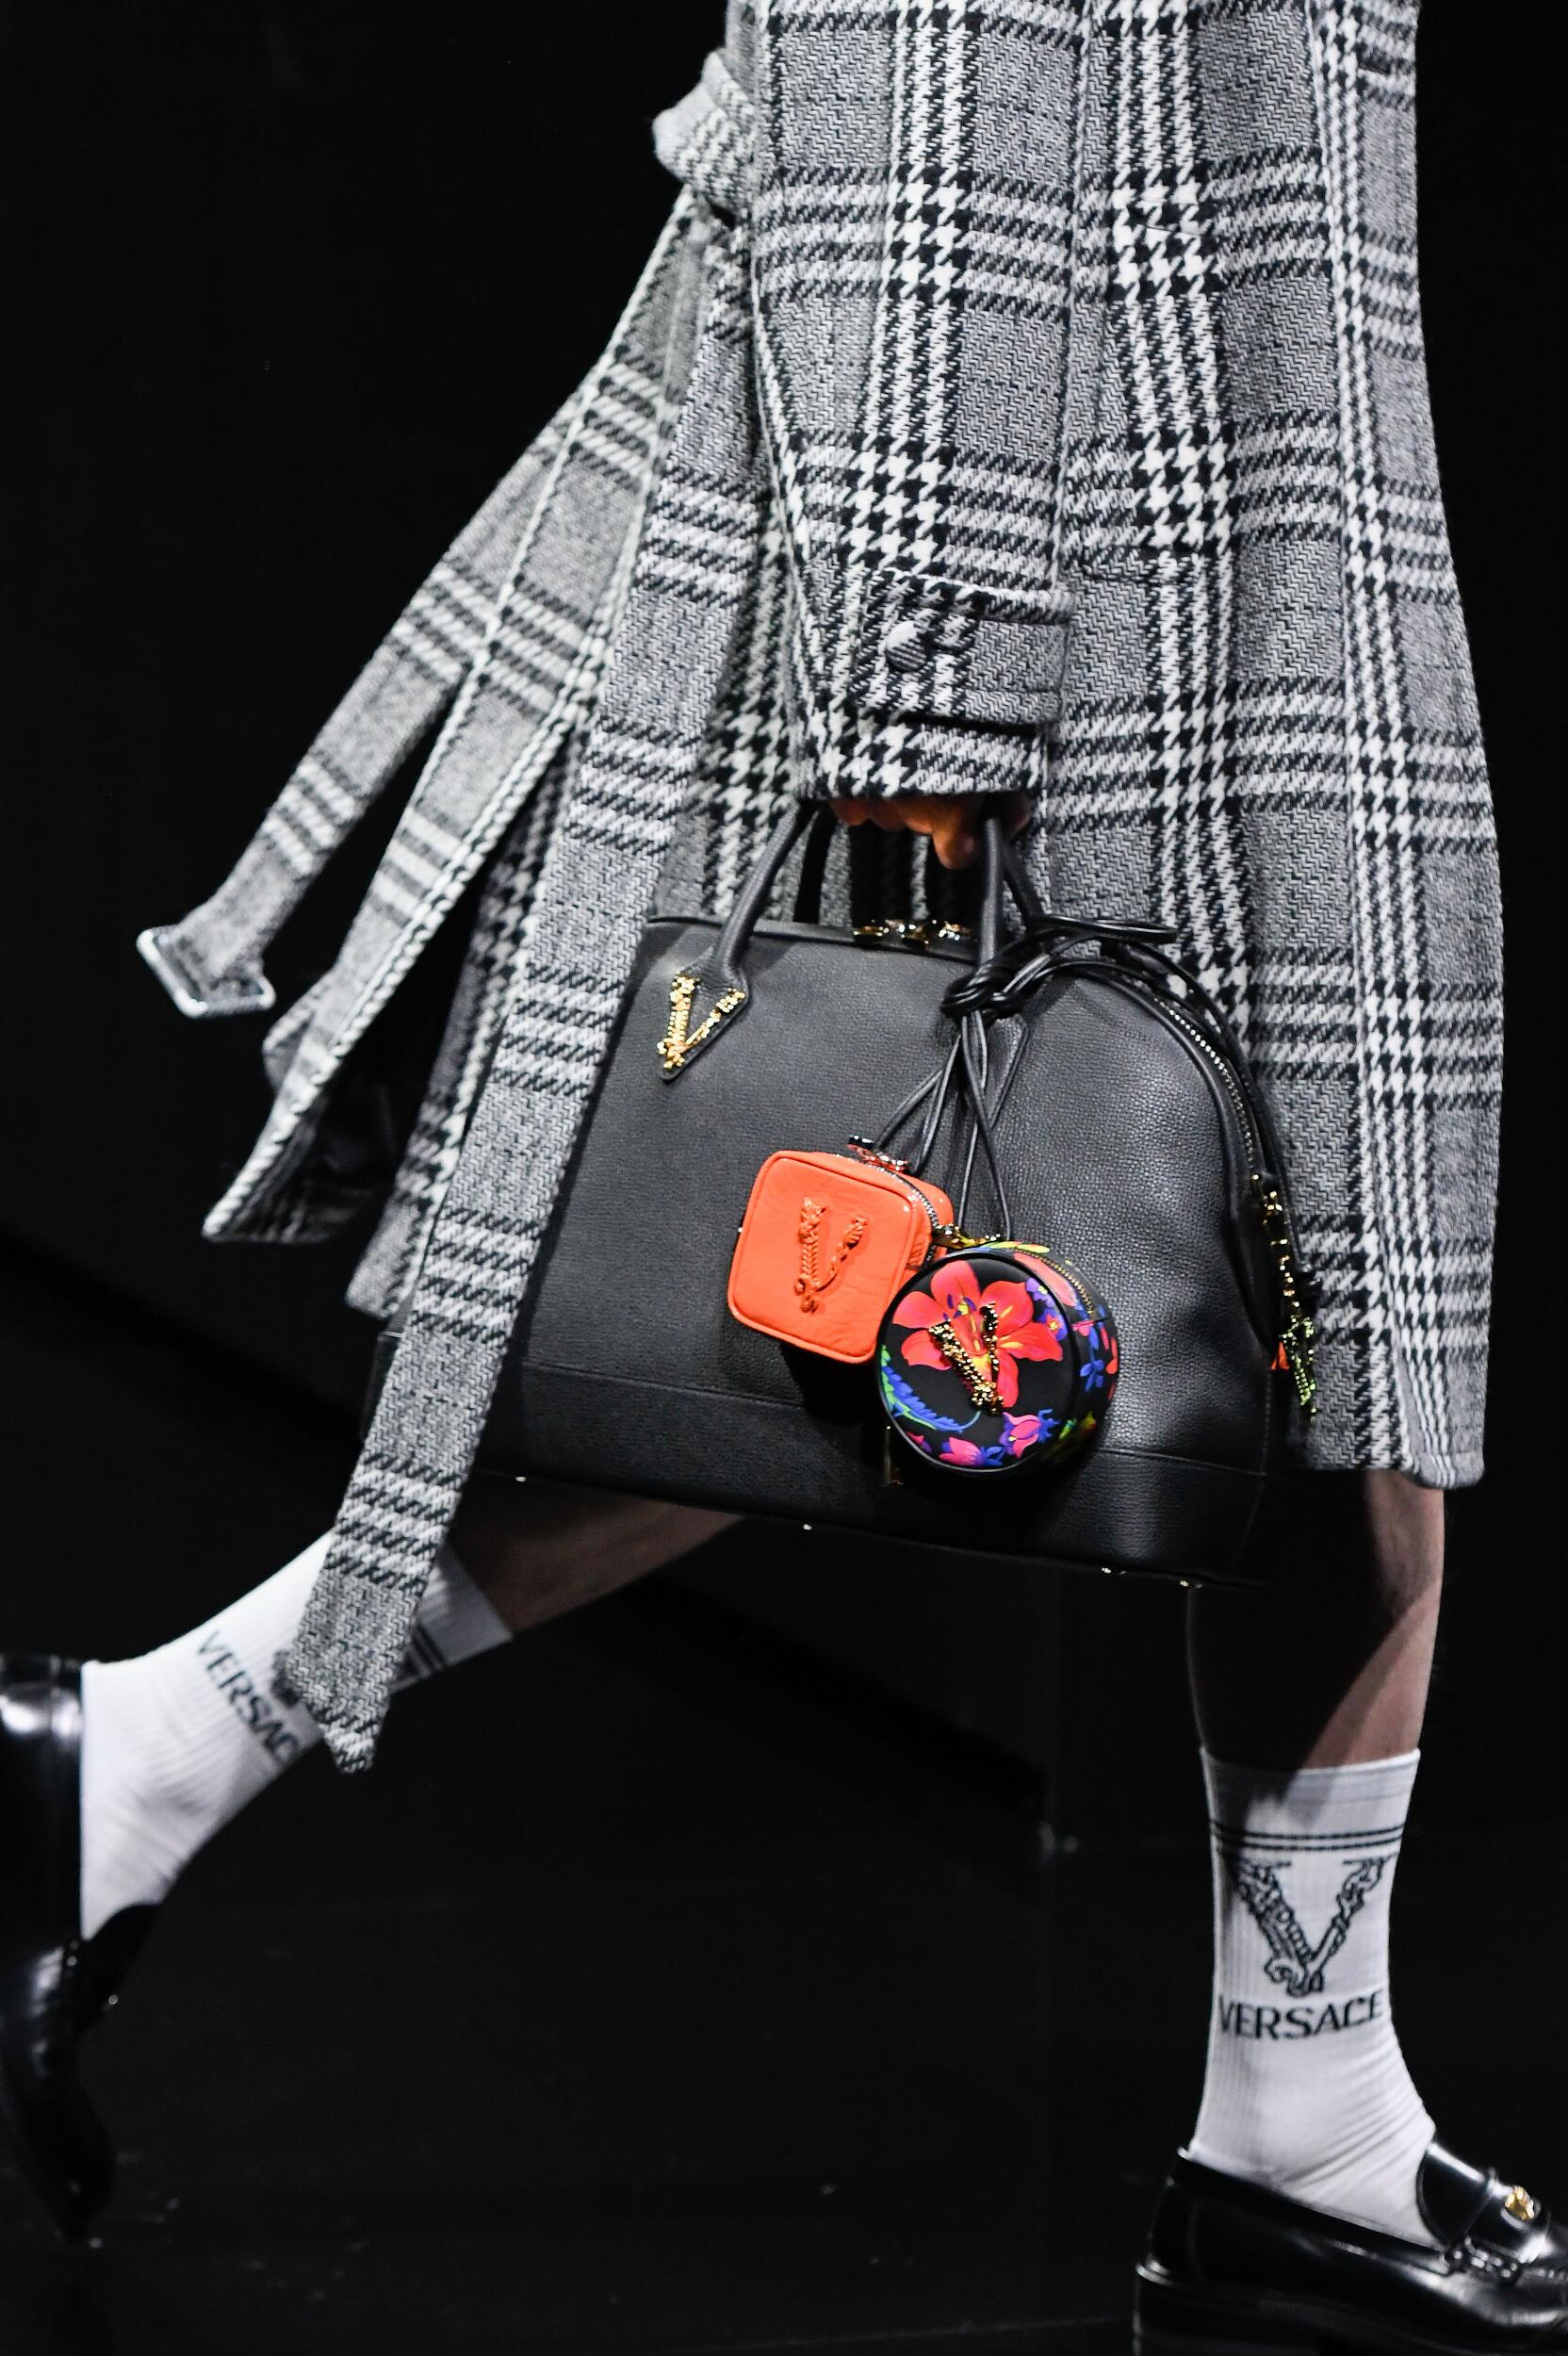 Versace Menswear Bag 2020 21